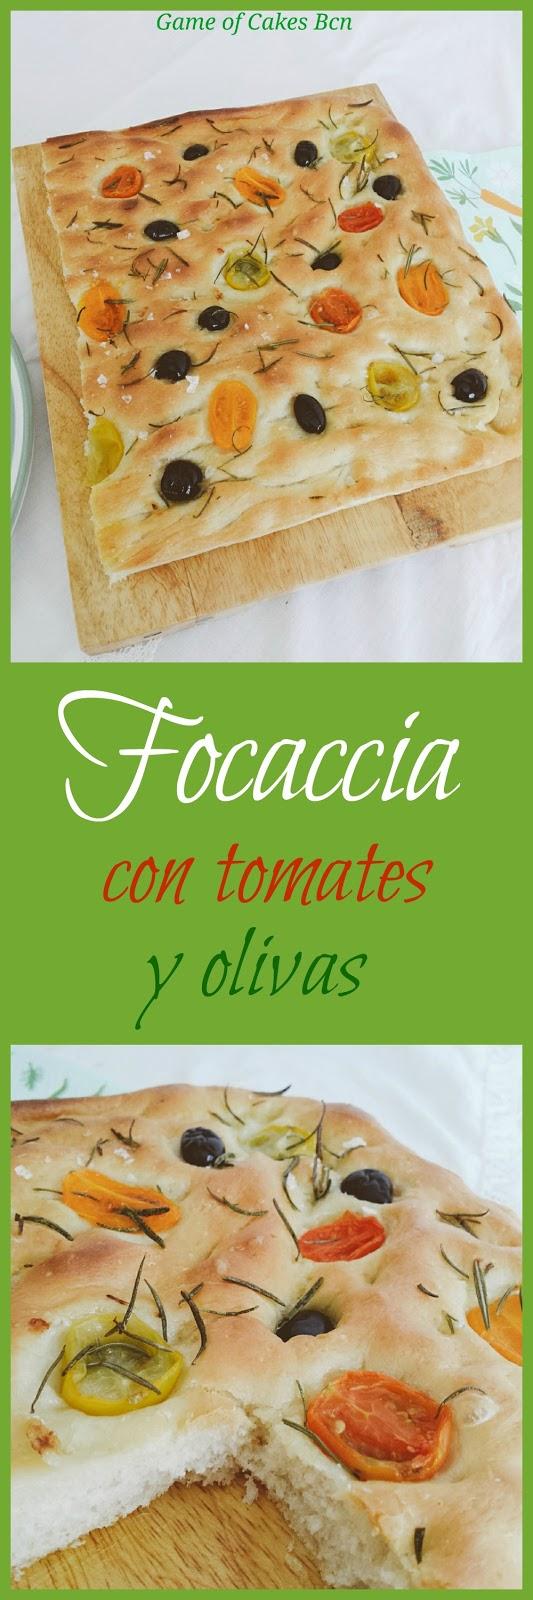 Focaccia con romero, tomatitos y olivas Game of Cakes Bcn